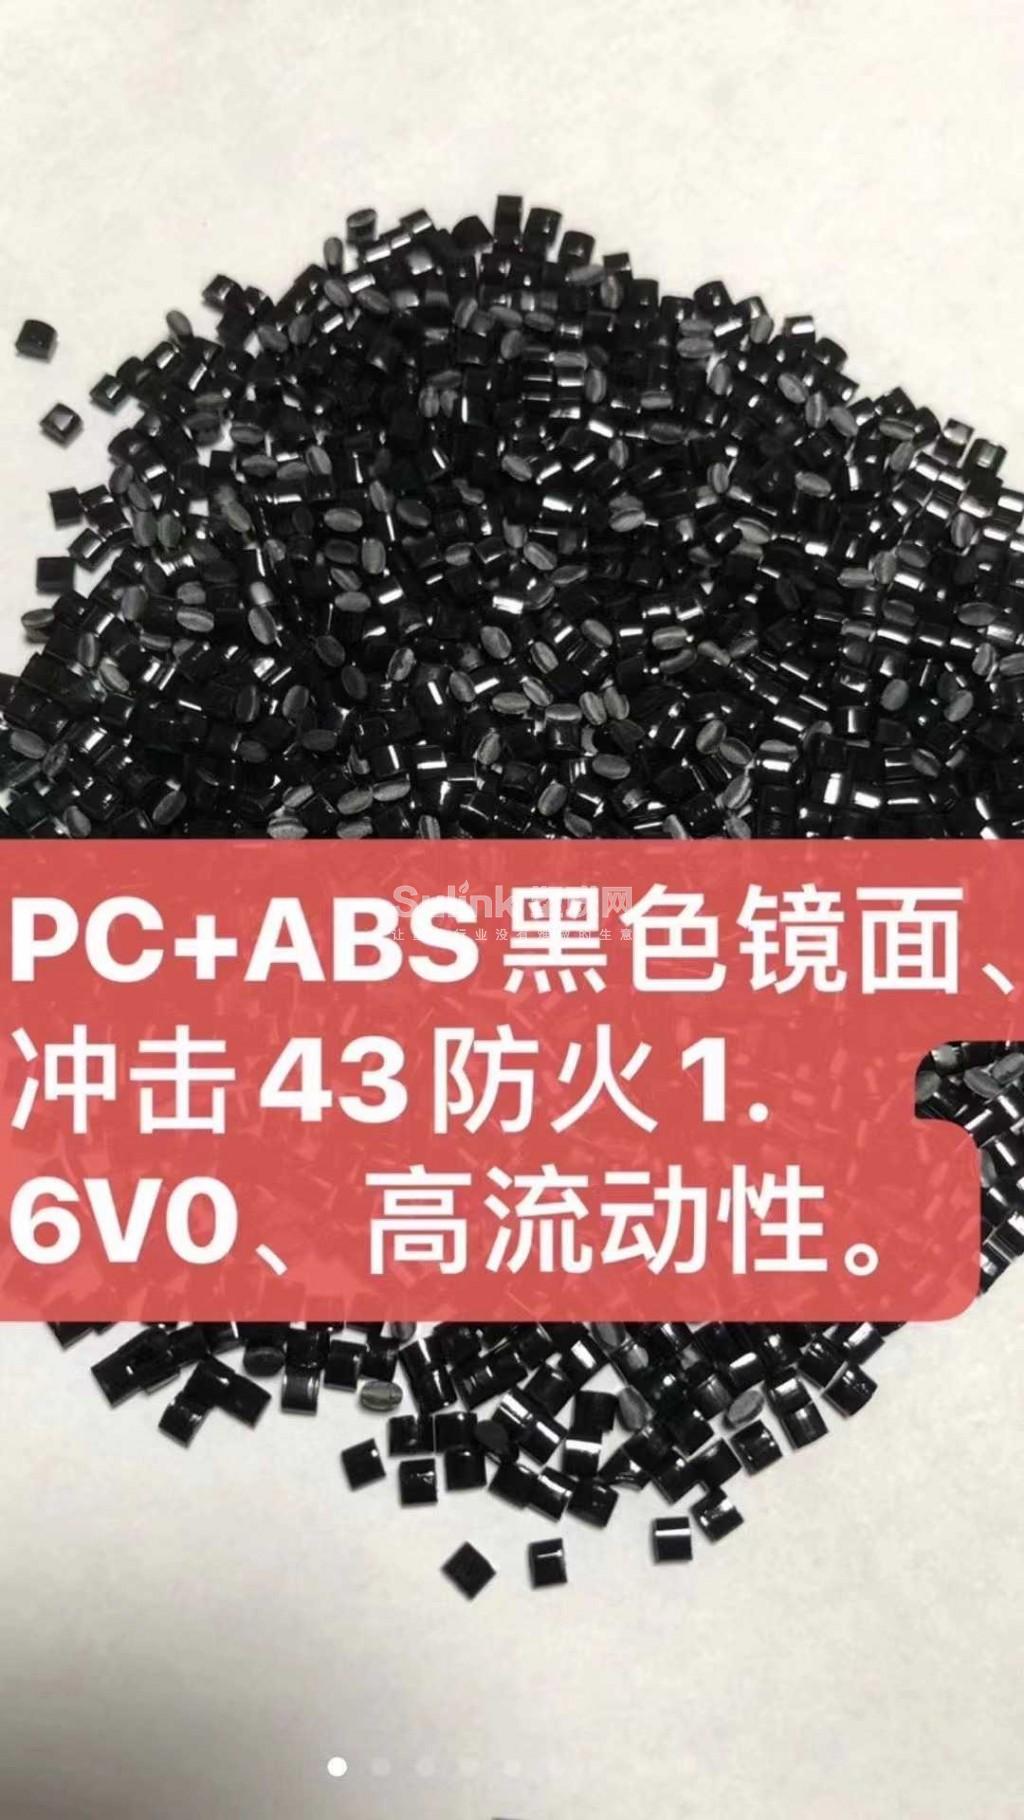 PC/ABS黑- 塑联网 - 塑料联网信息服务平台